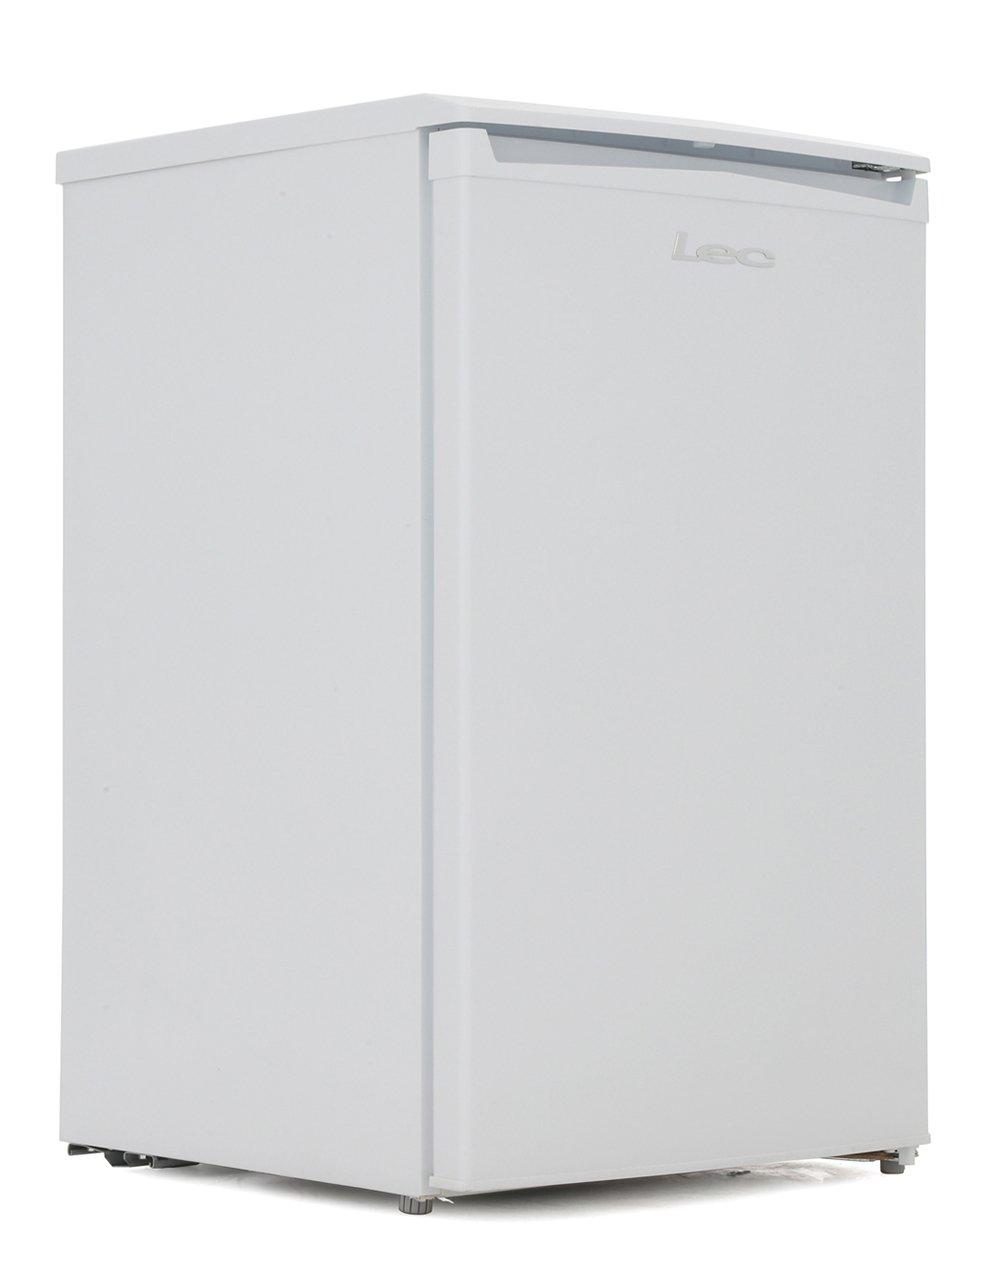 Lec R5017W White Fridge with Ice Box